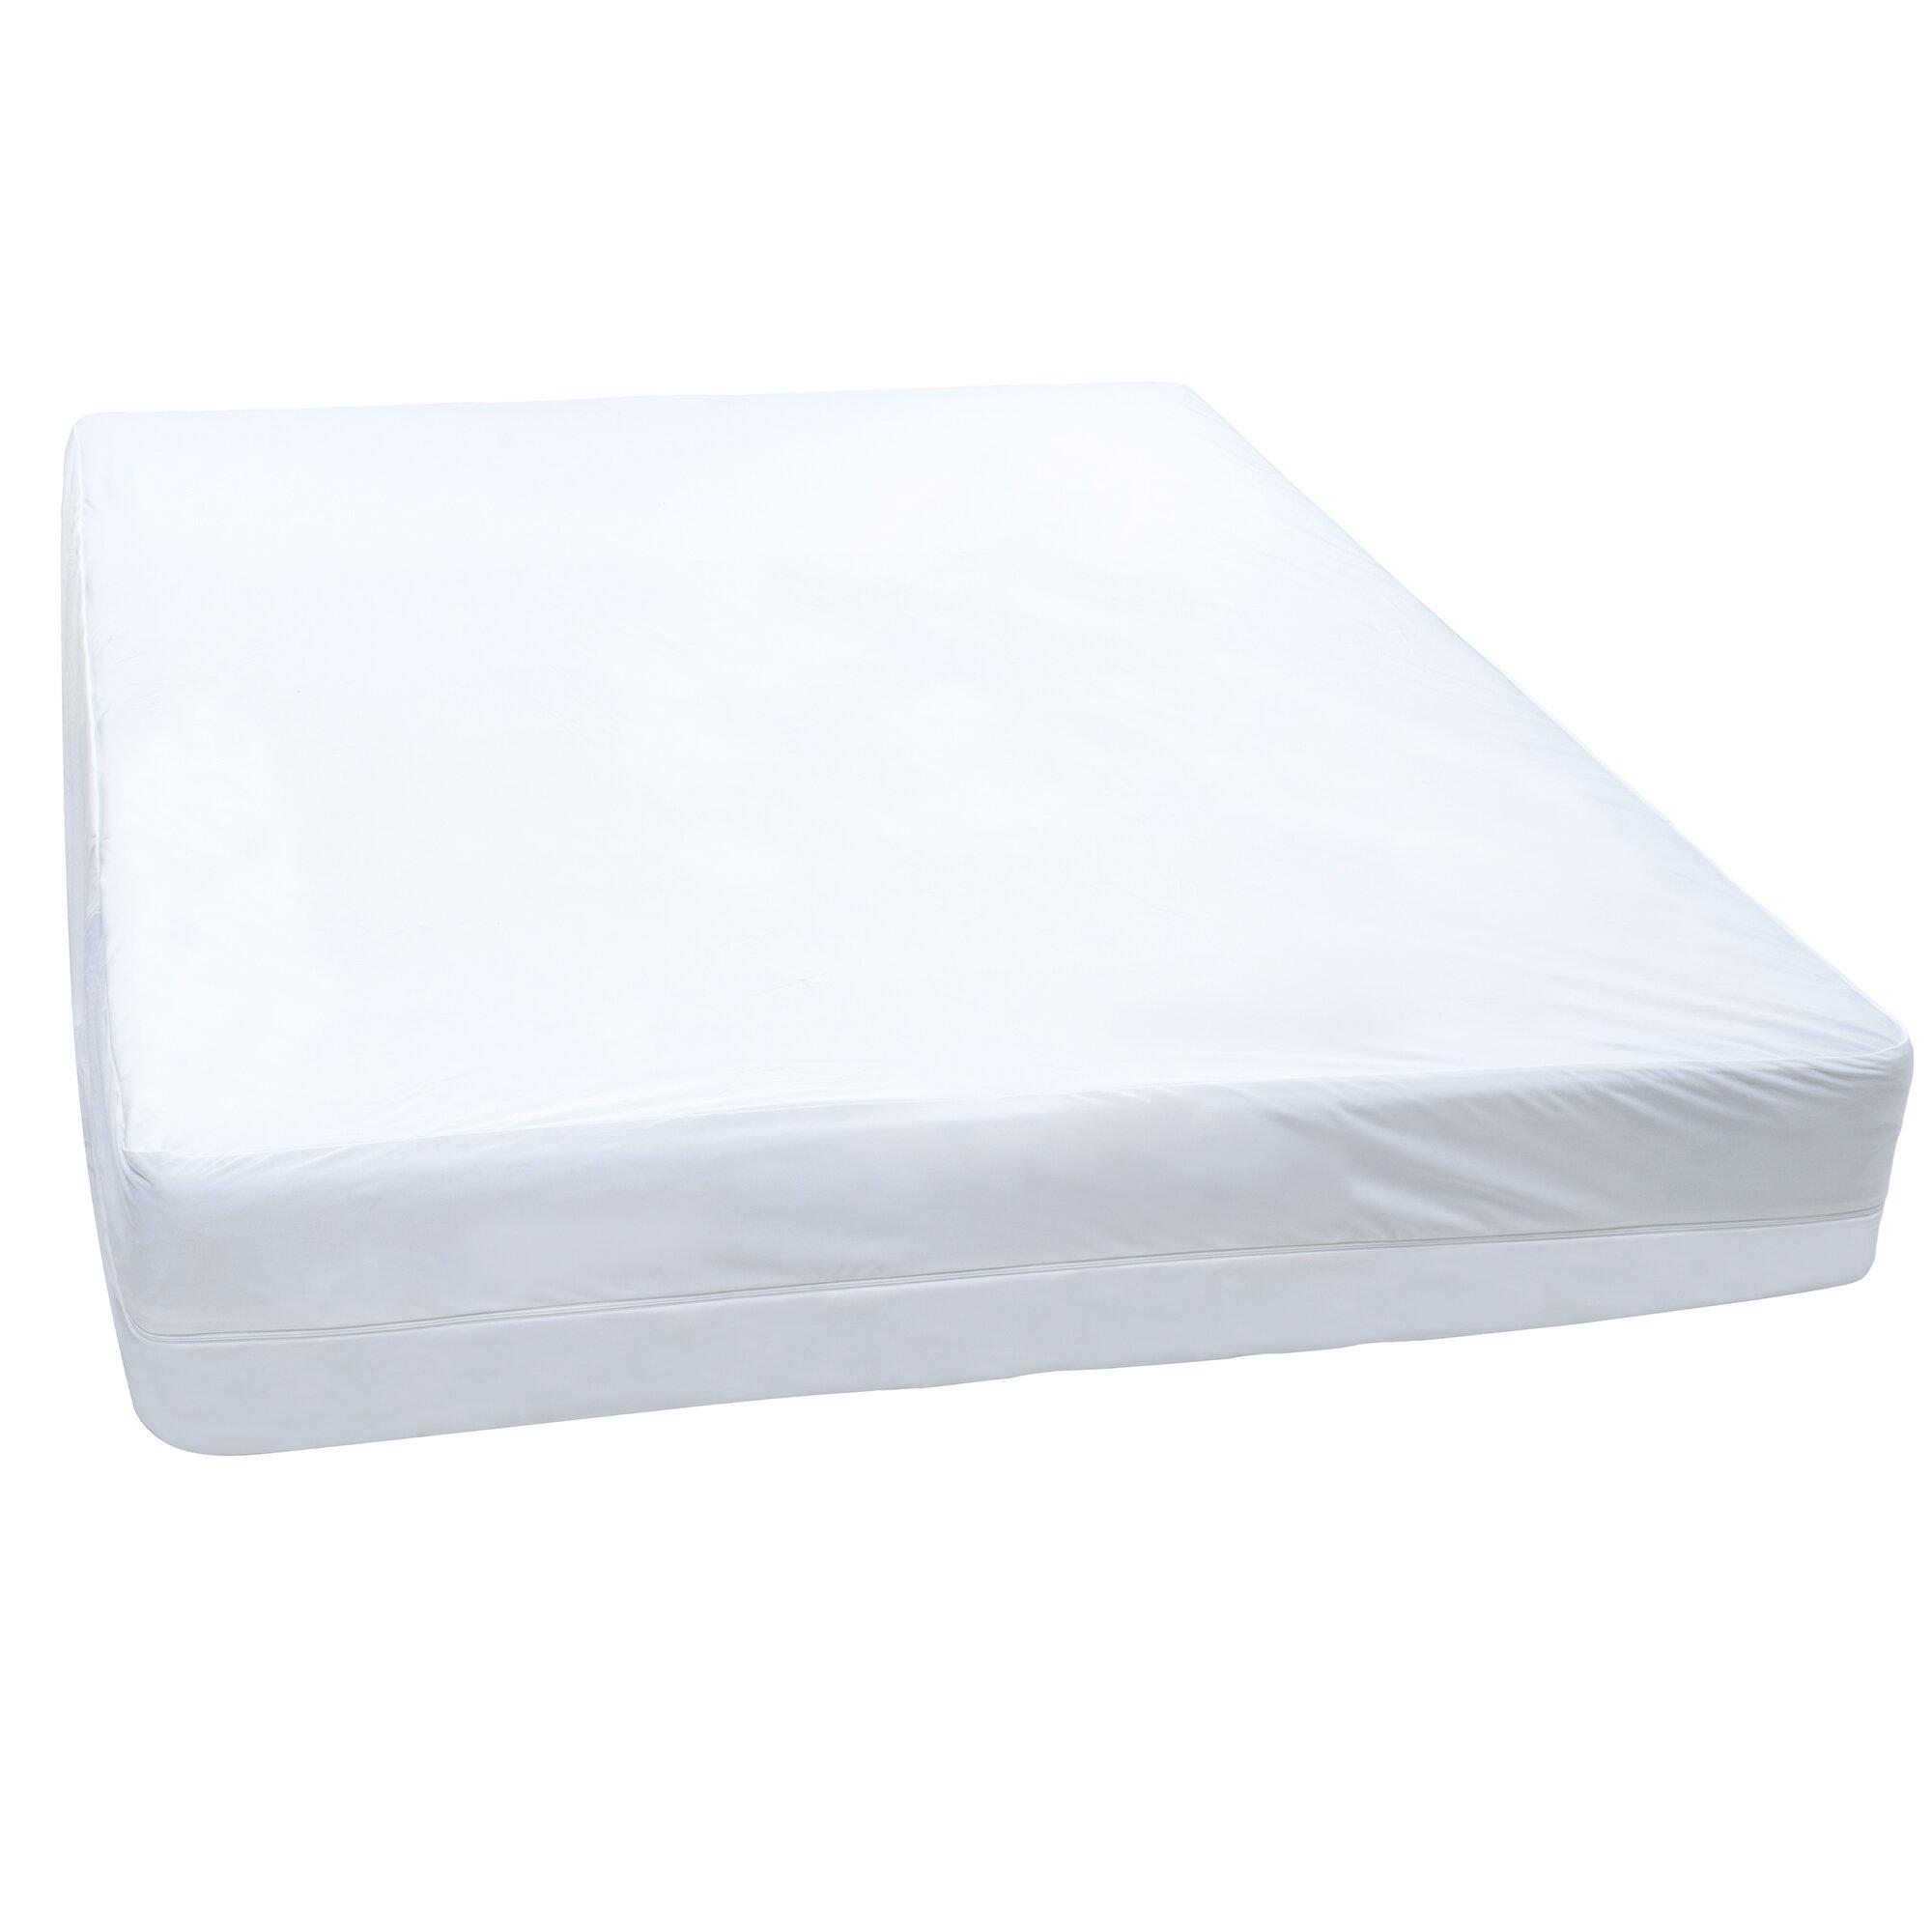 Remedy Bed Bug Box Spring Hypoallergenic Waterproof